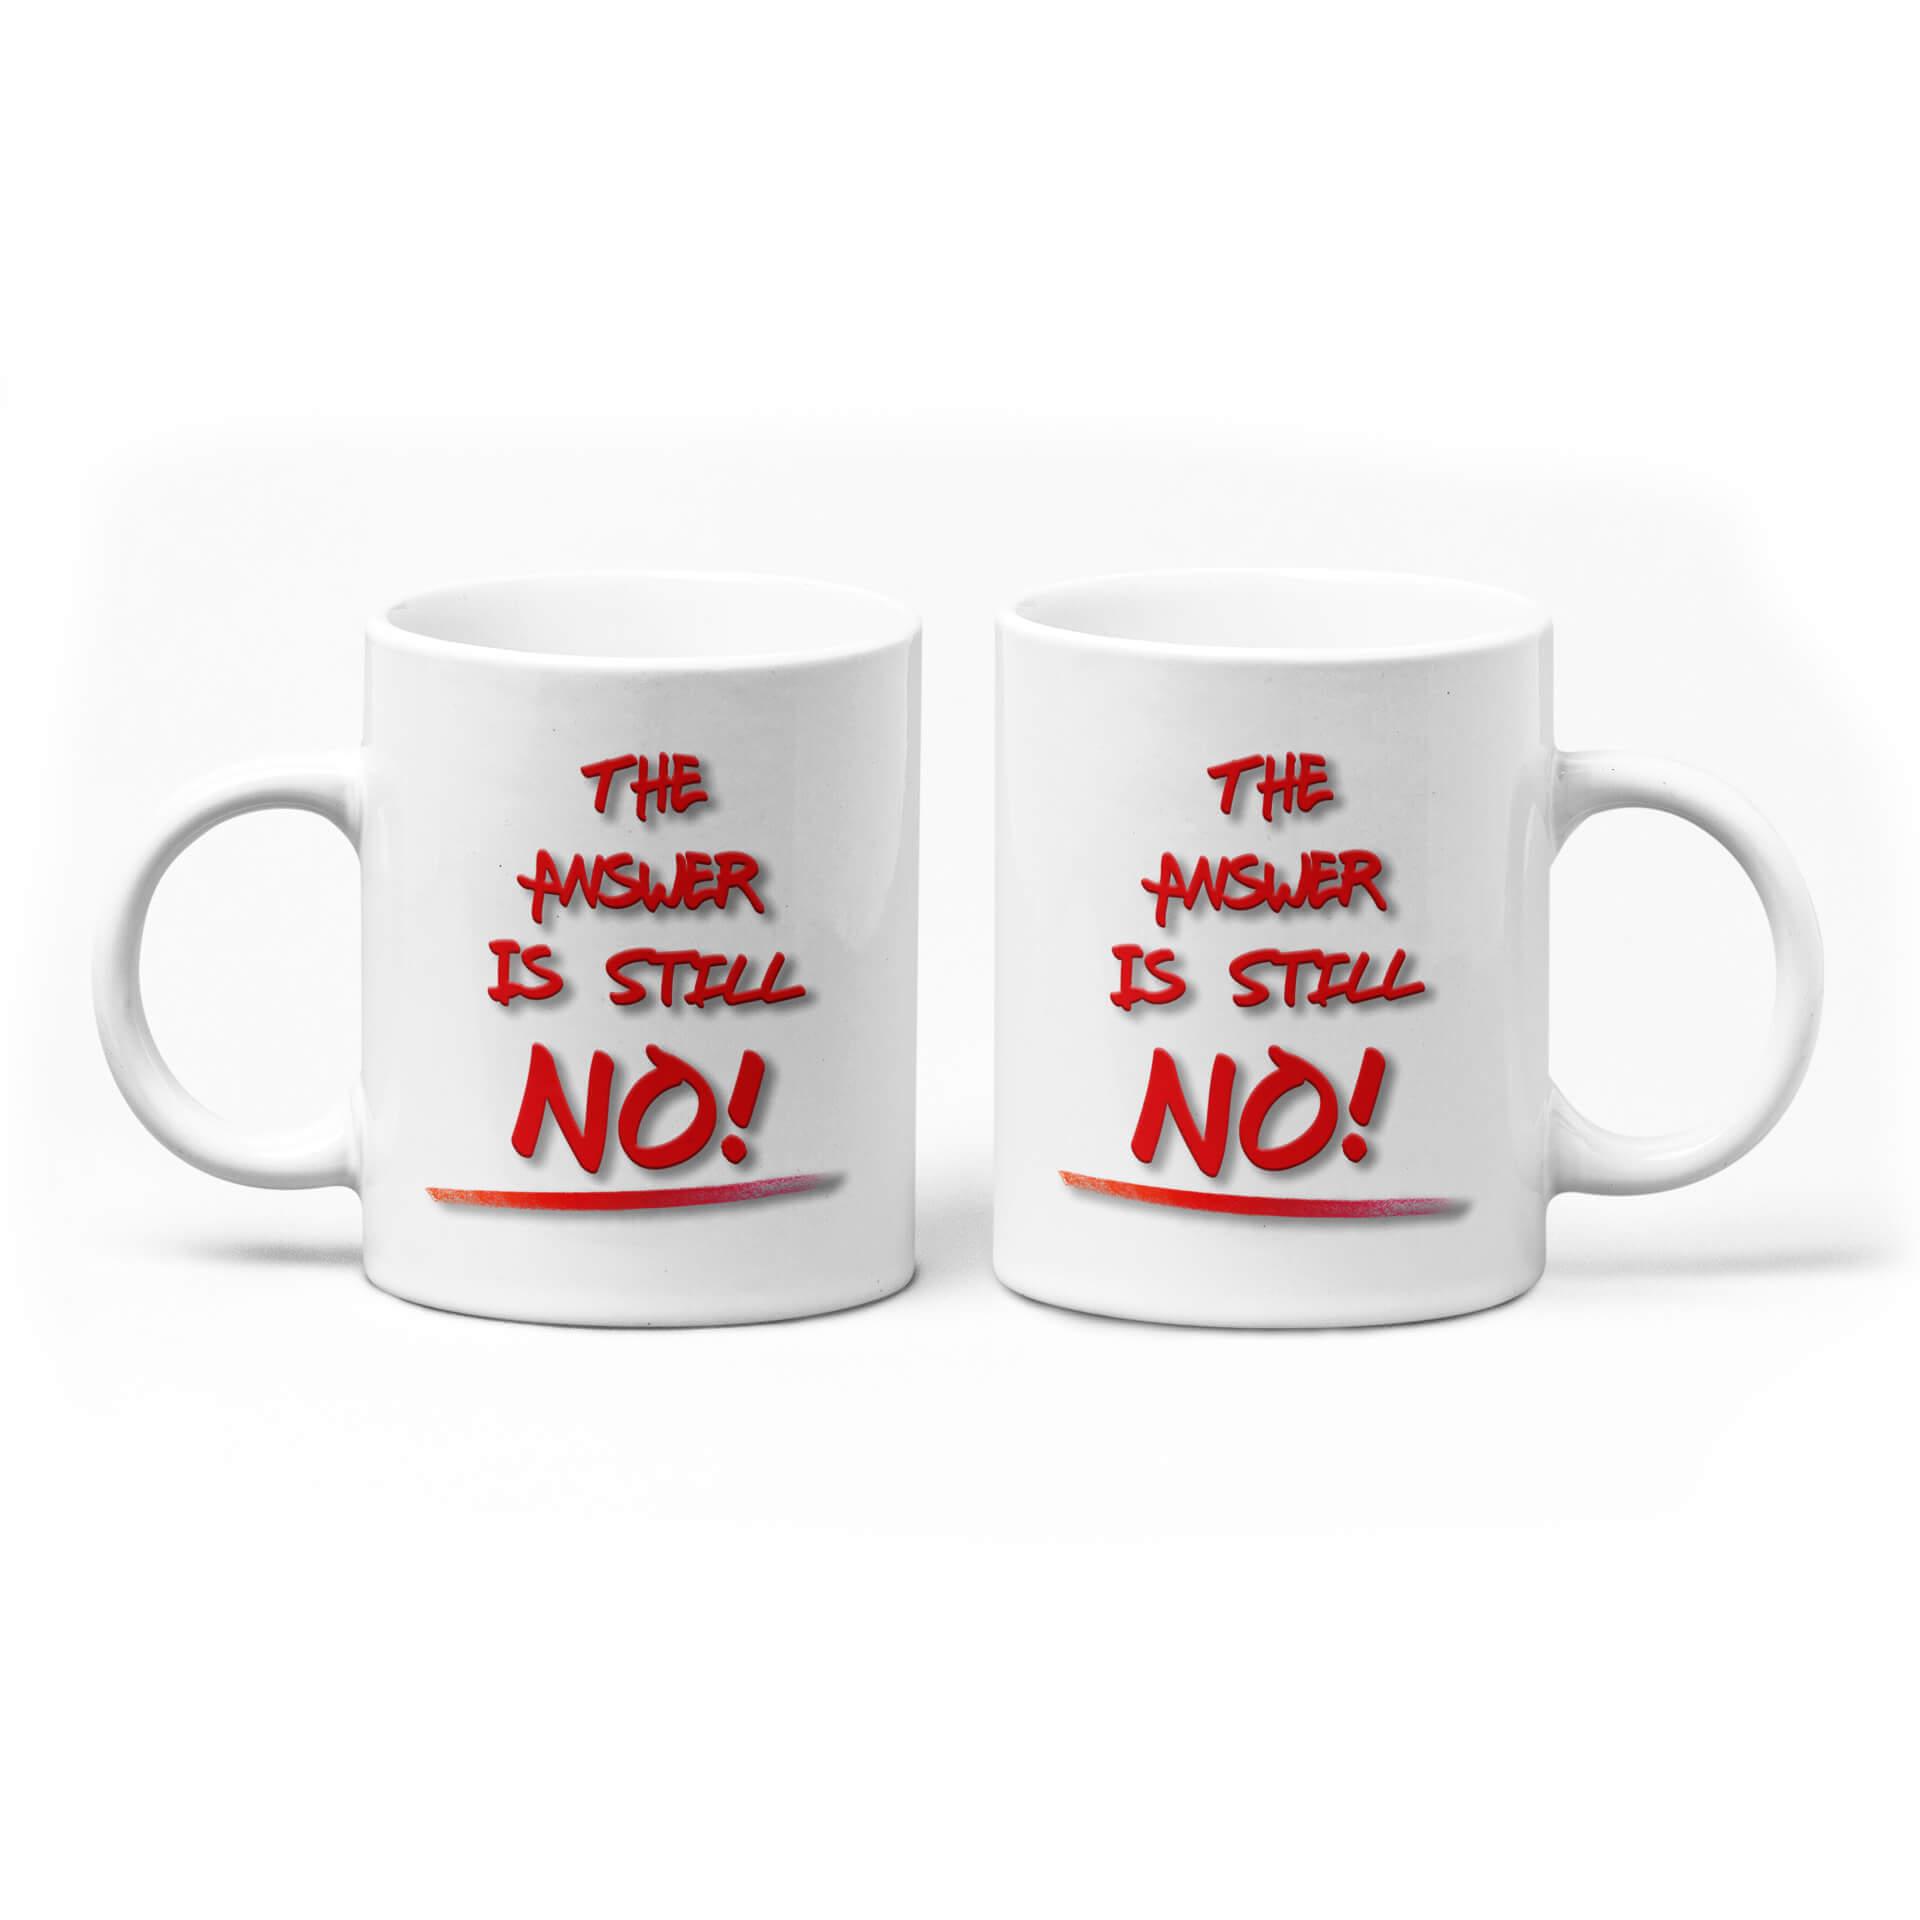 The Answer Is Still NO! Mug